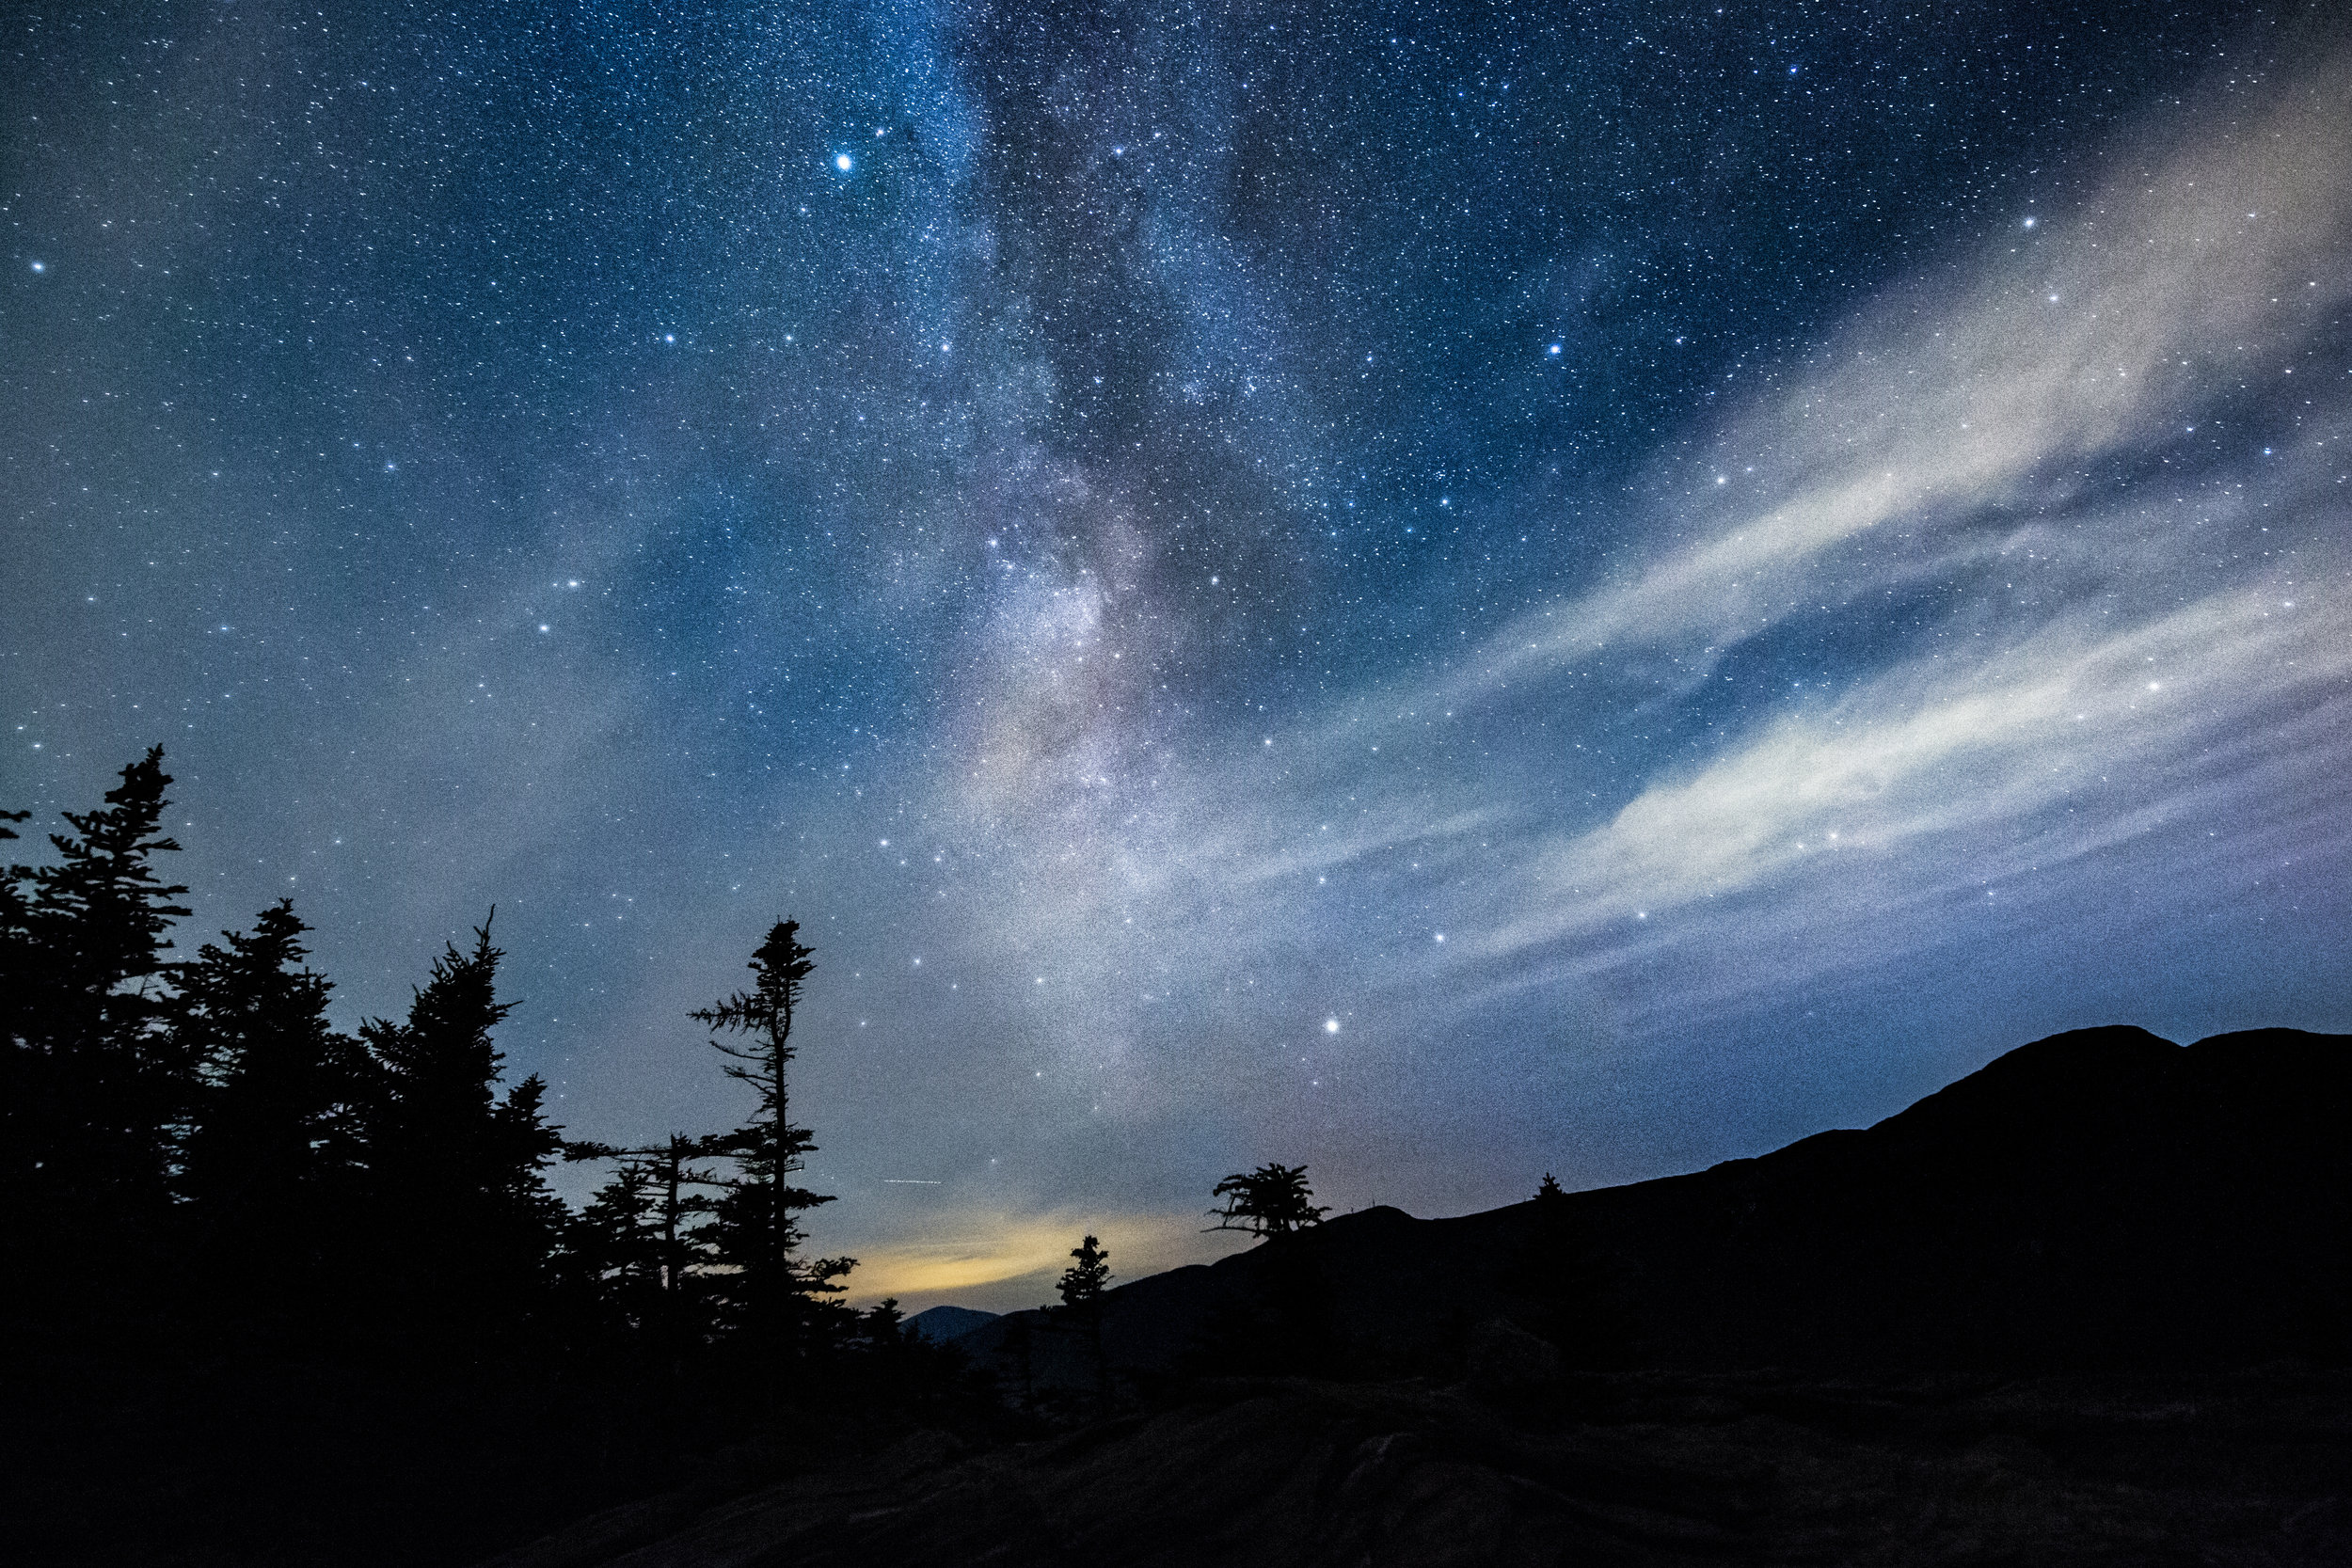 2017_09_21_SD_spruce_stars_5d_012-2.jpg